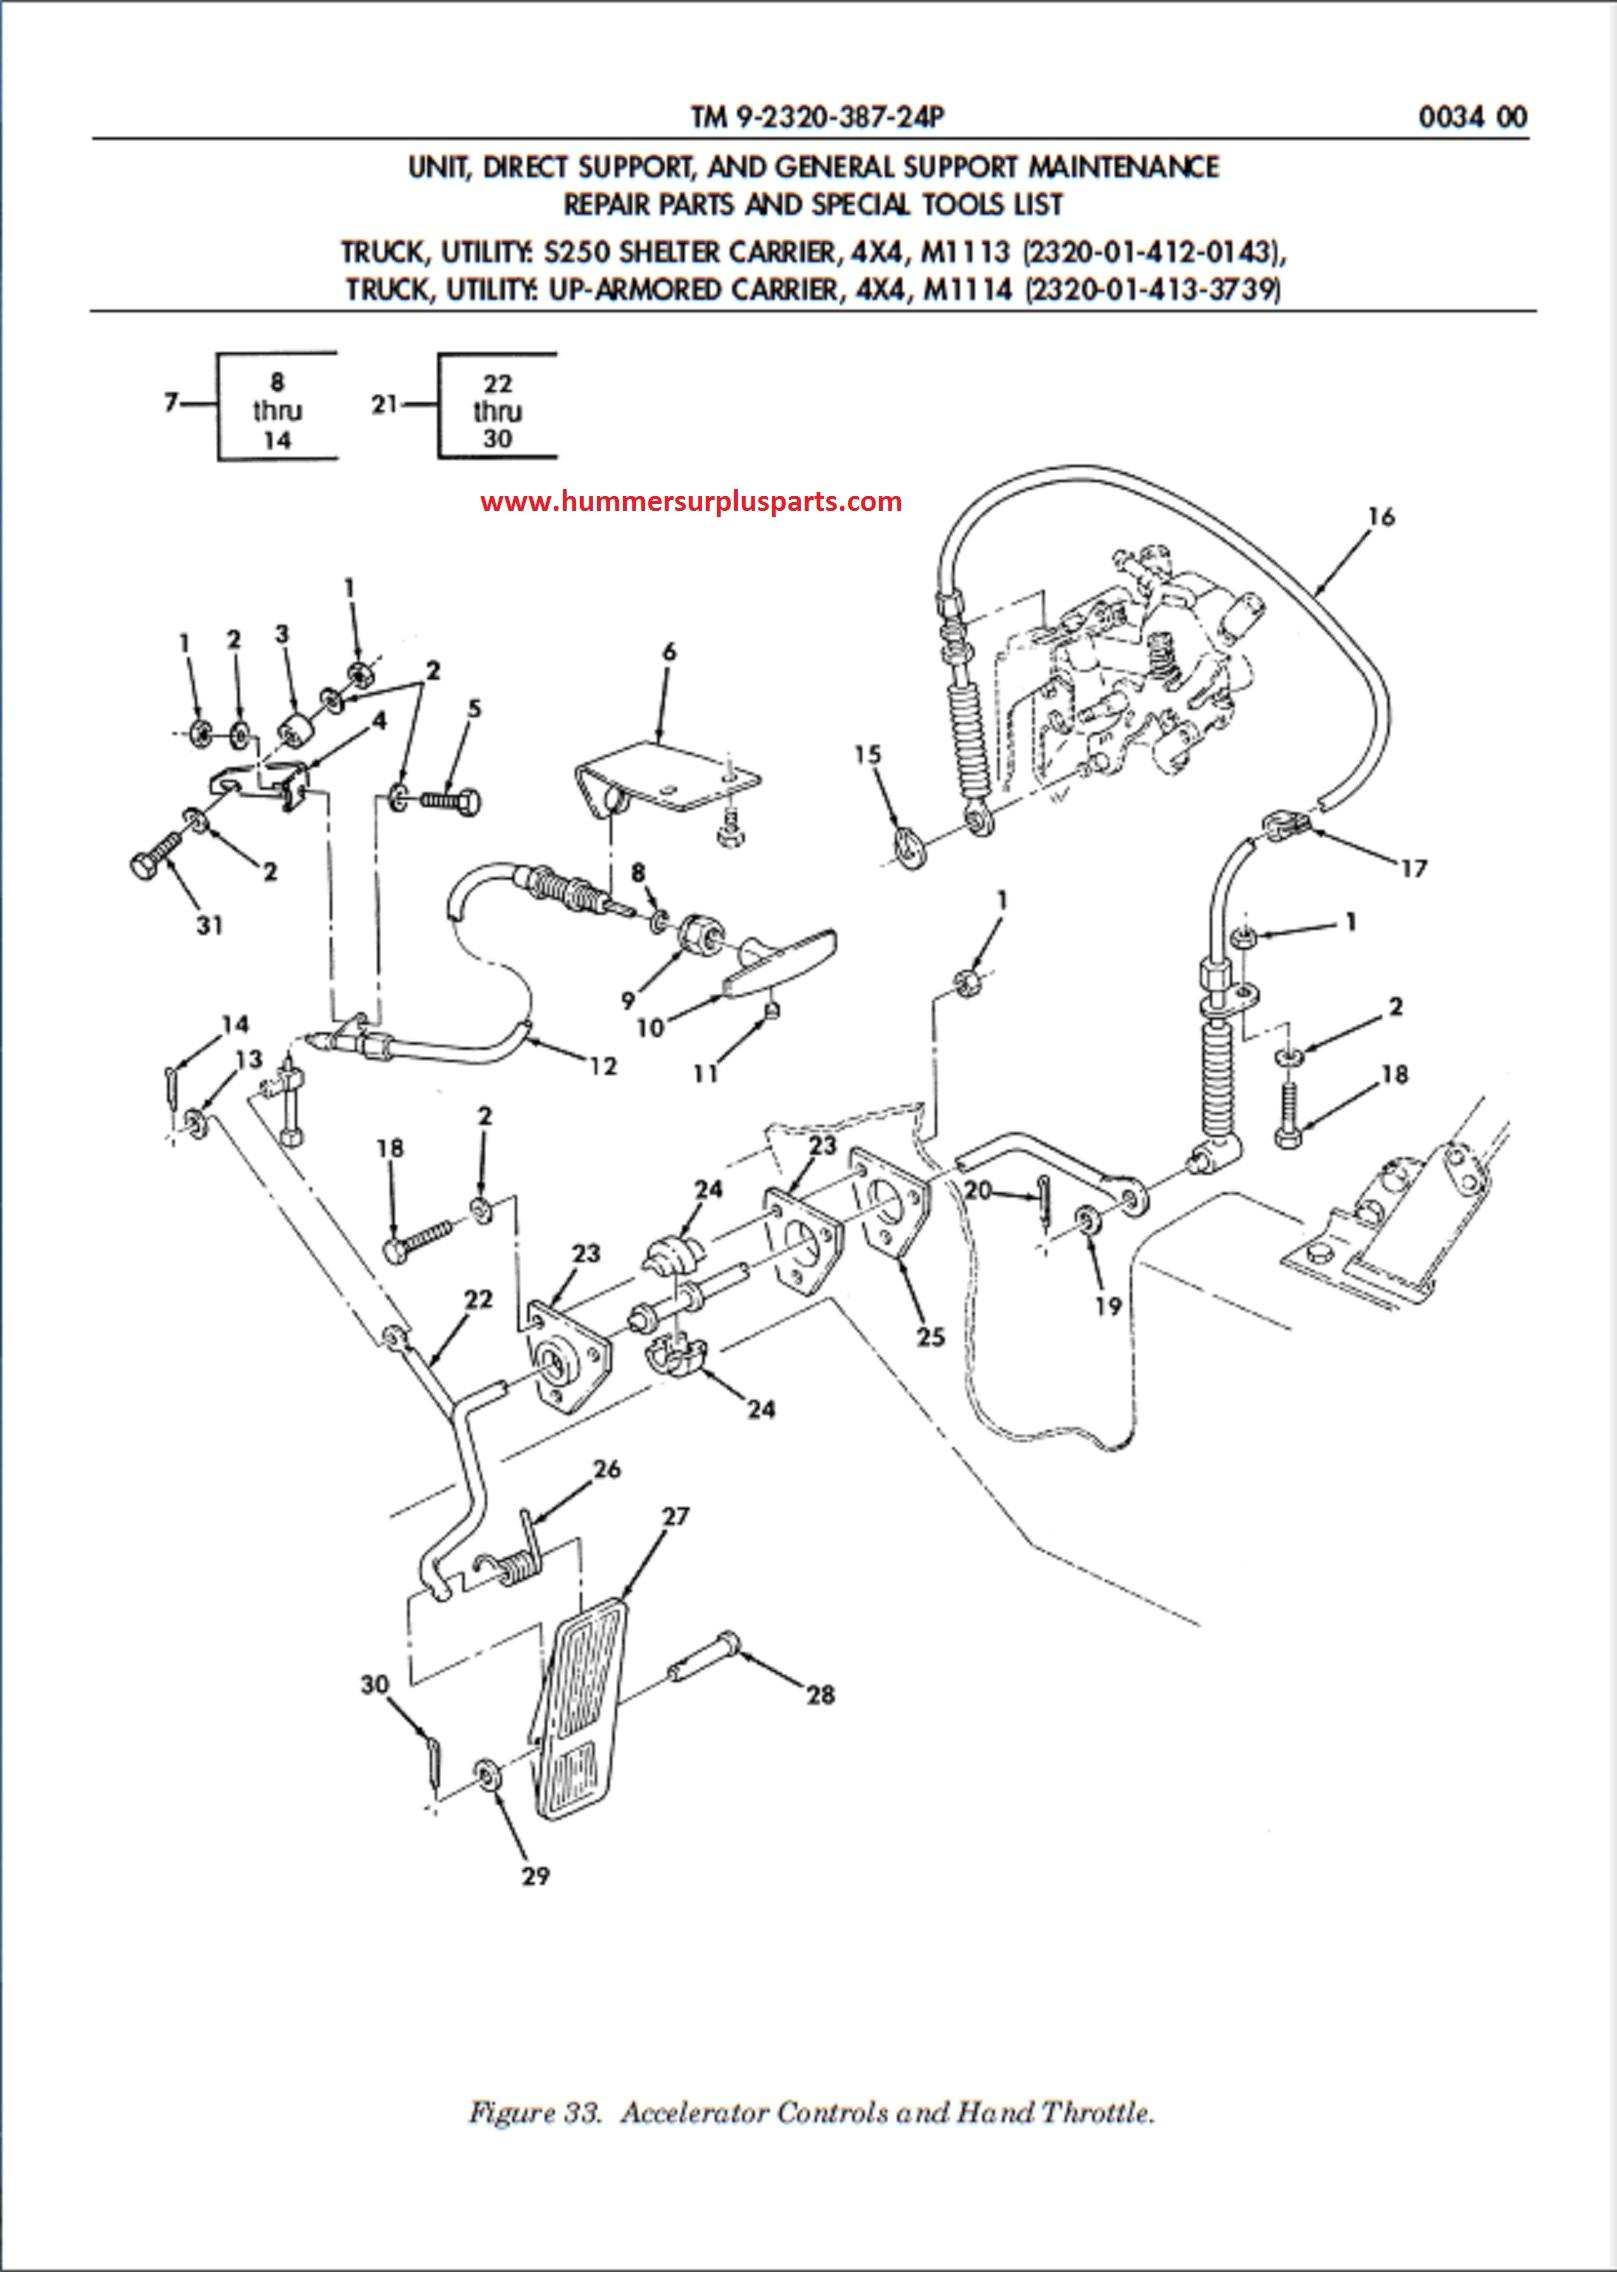 Hmmwv Hand Throttle Push Pull Assembly 12338359 Sf5593621 000 357 52 Pushpull Diagram 0012 1 2590 01 279 5714